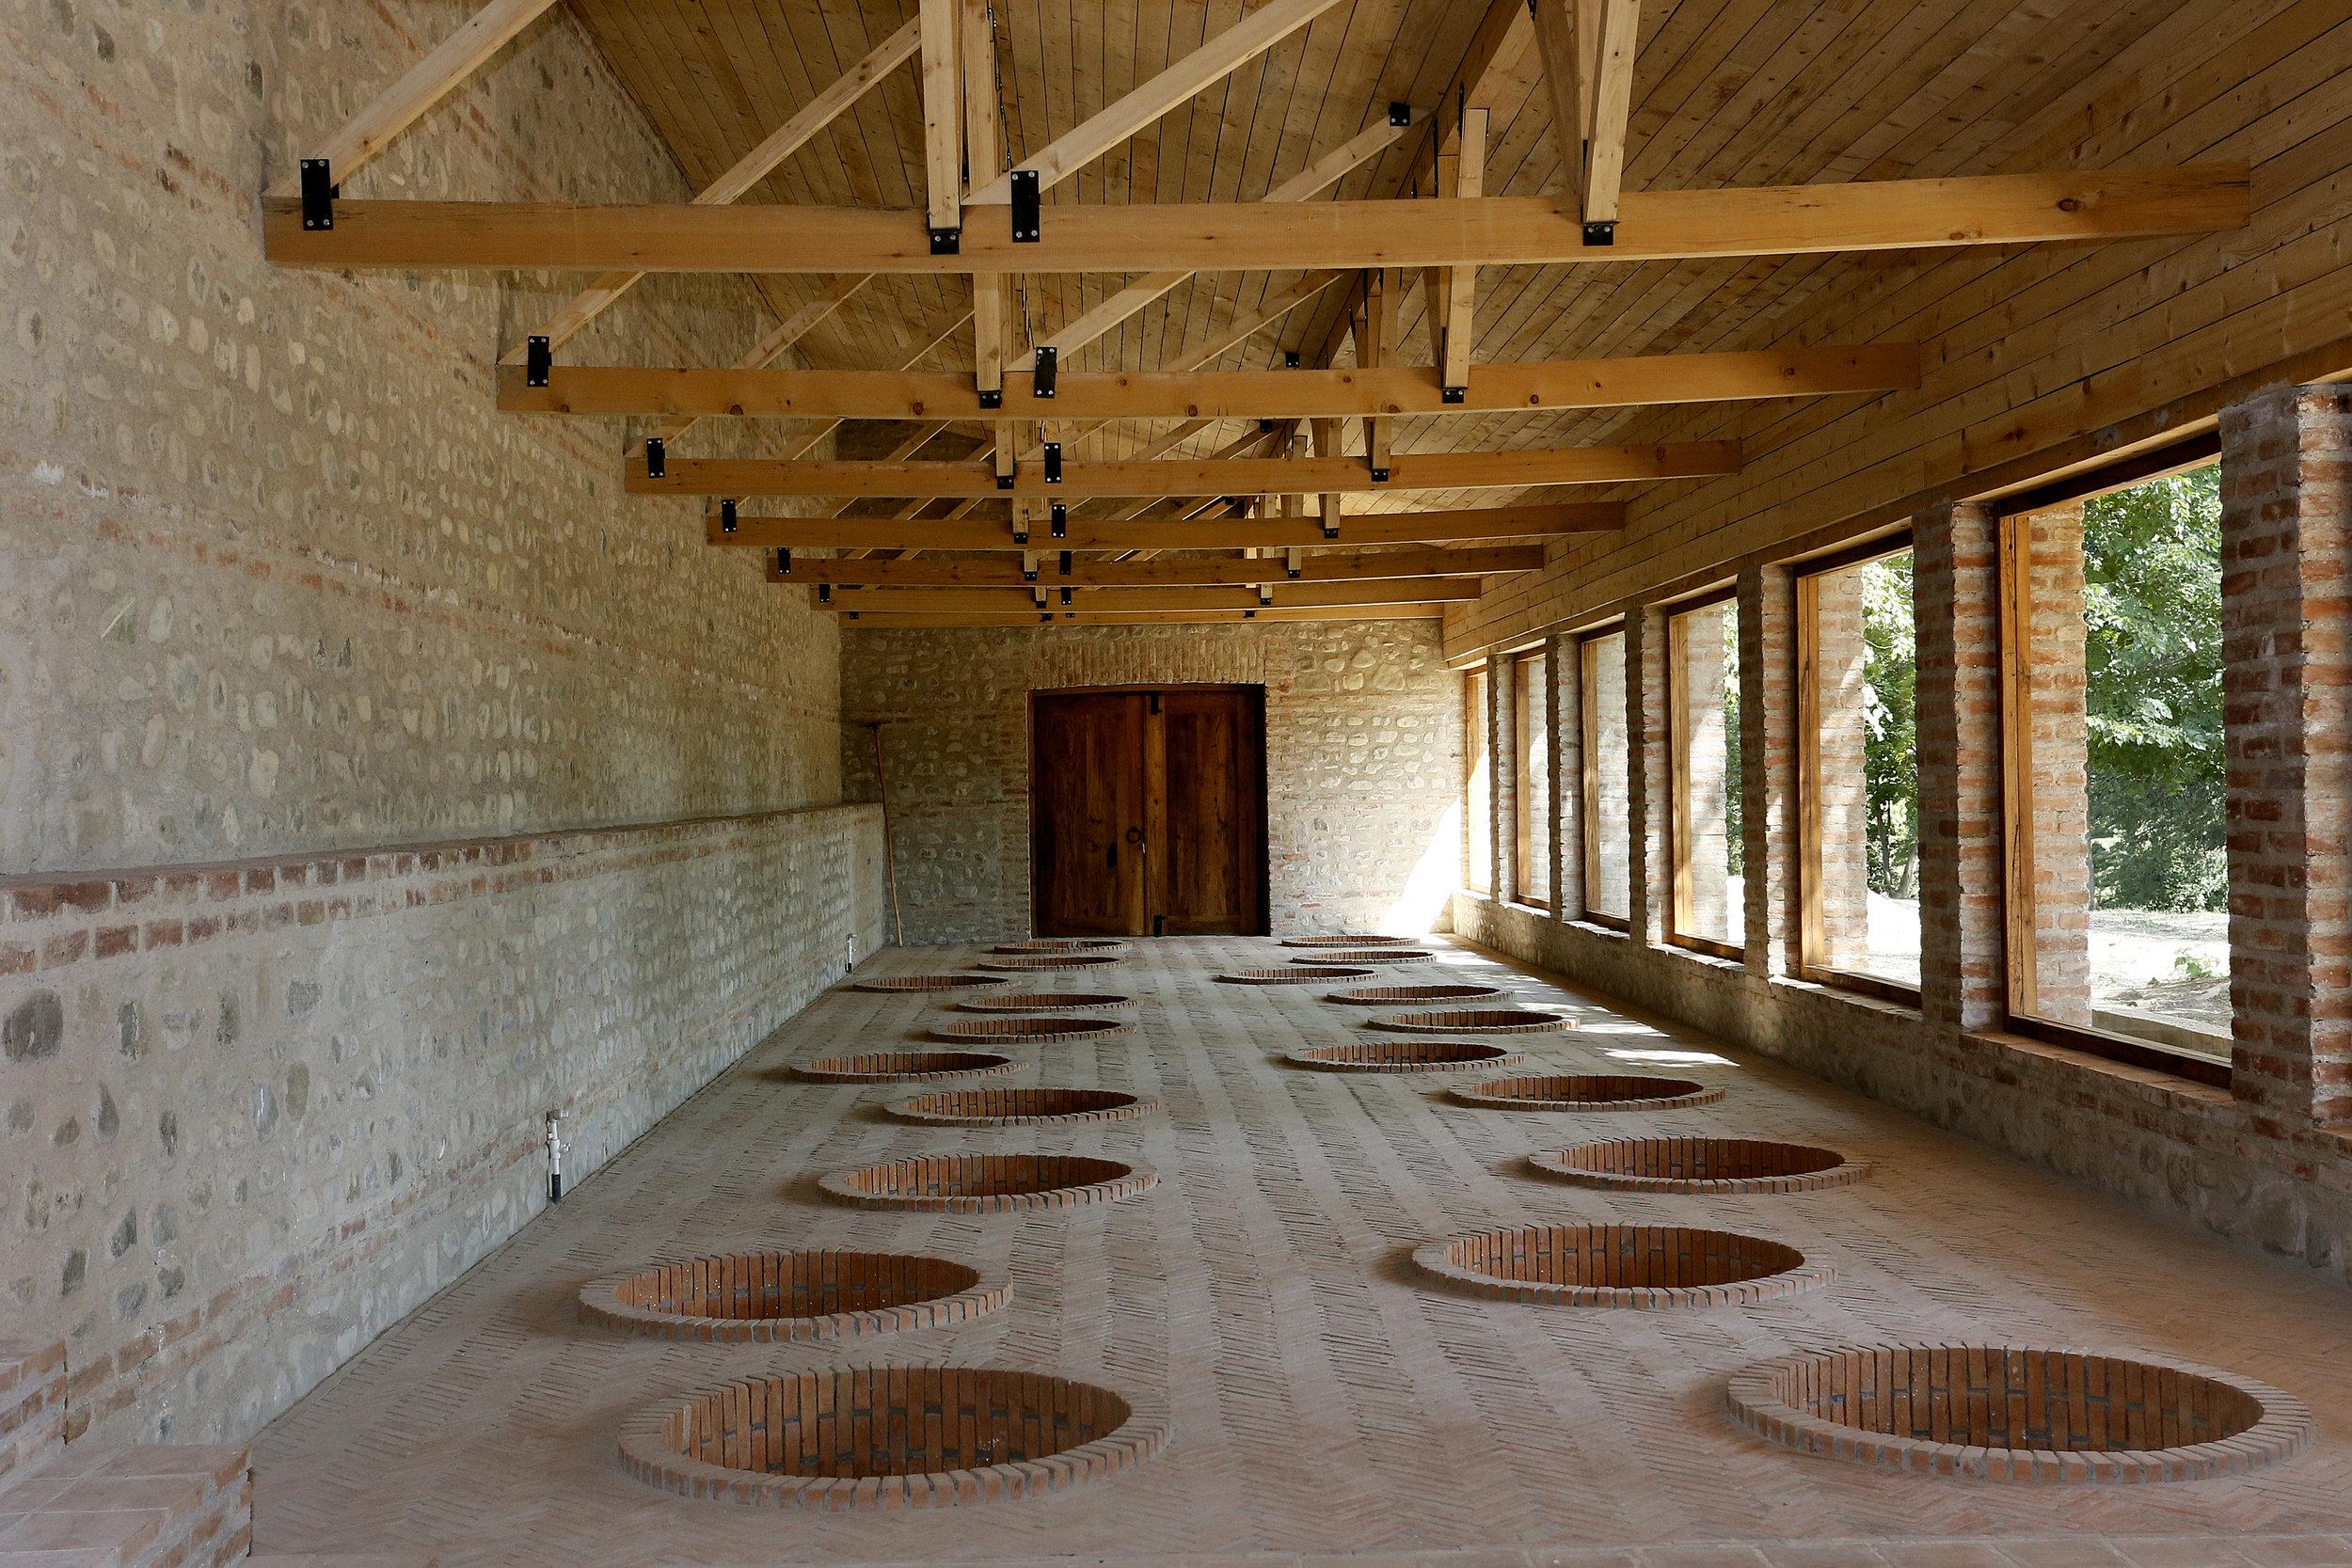 Inside a marani or cellar where a number of qvevri are buried underground to ferment organic Georgian wine